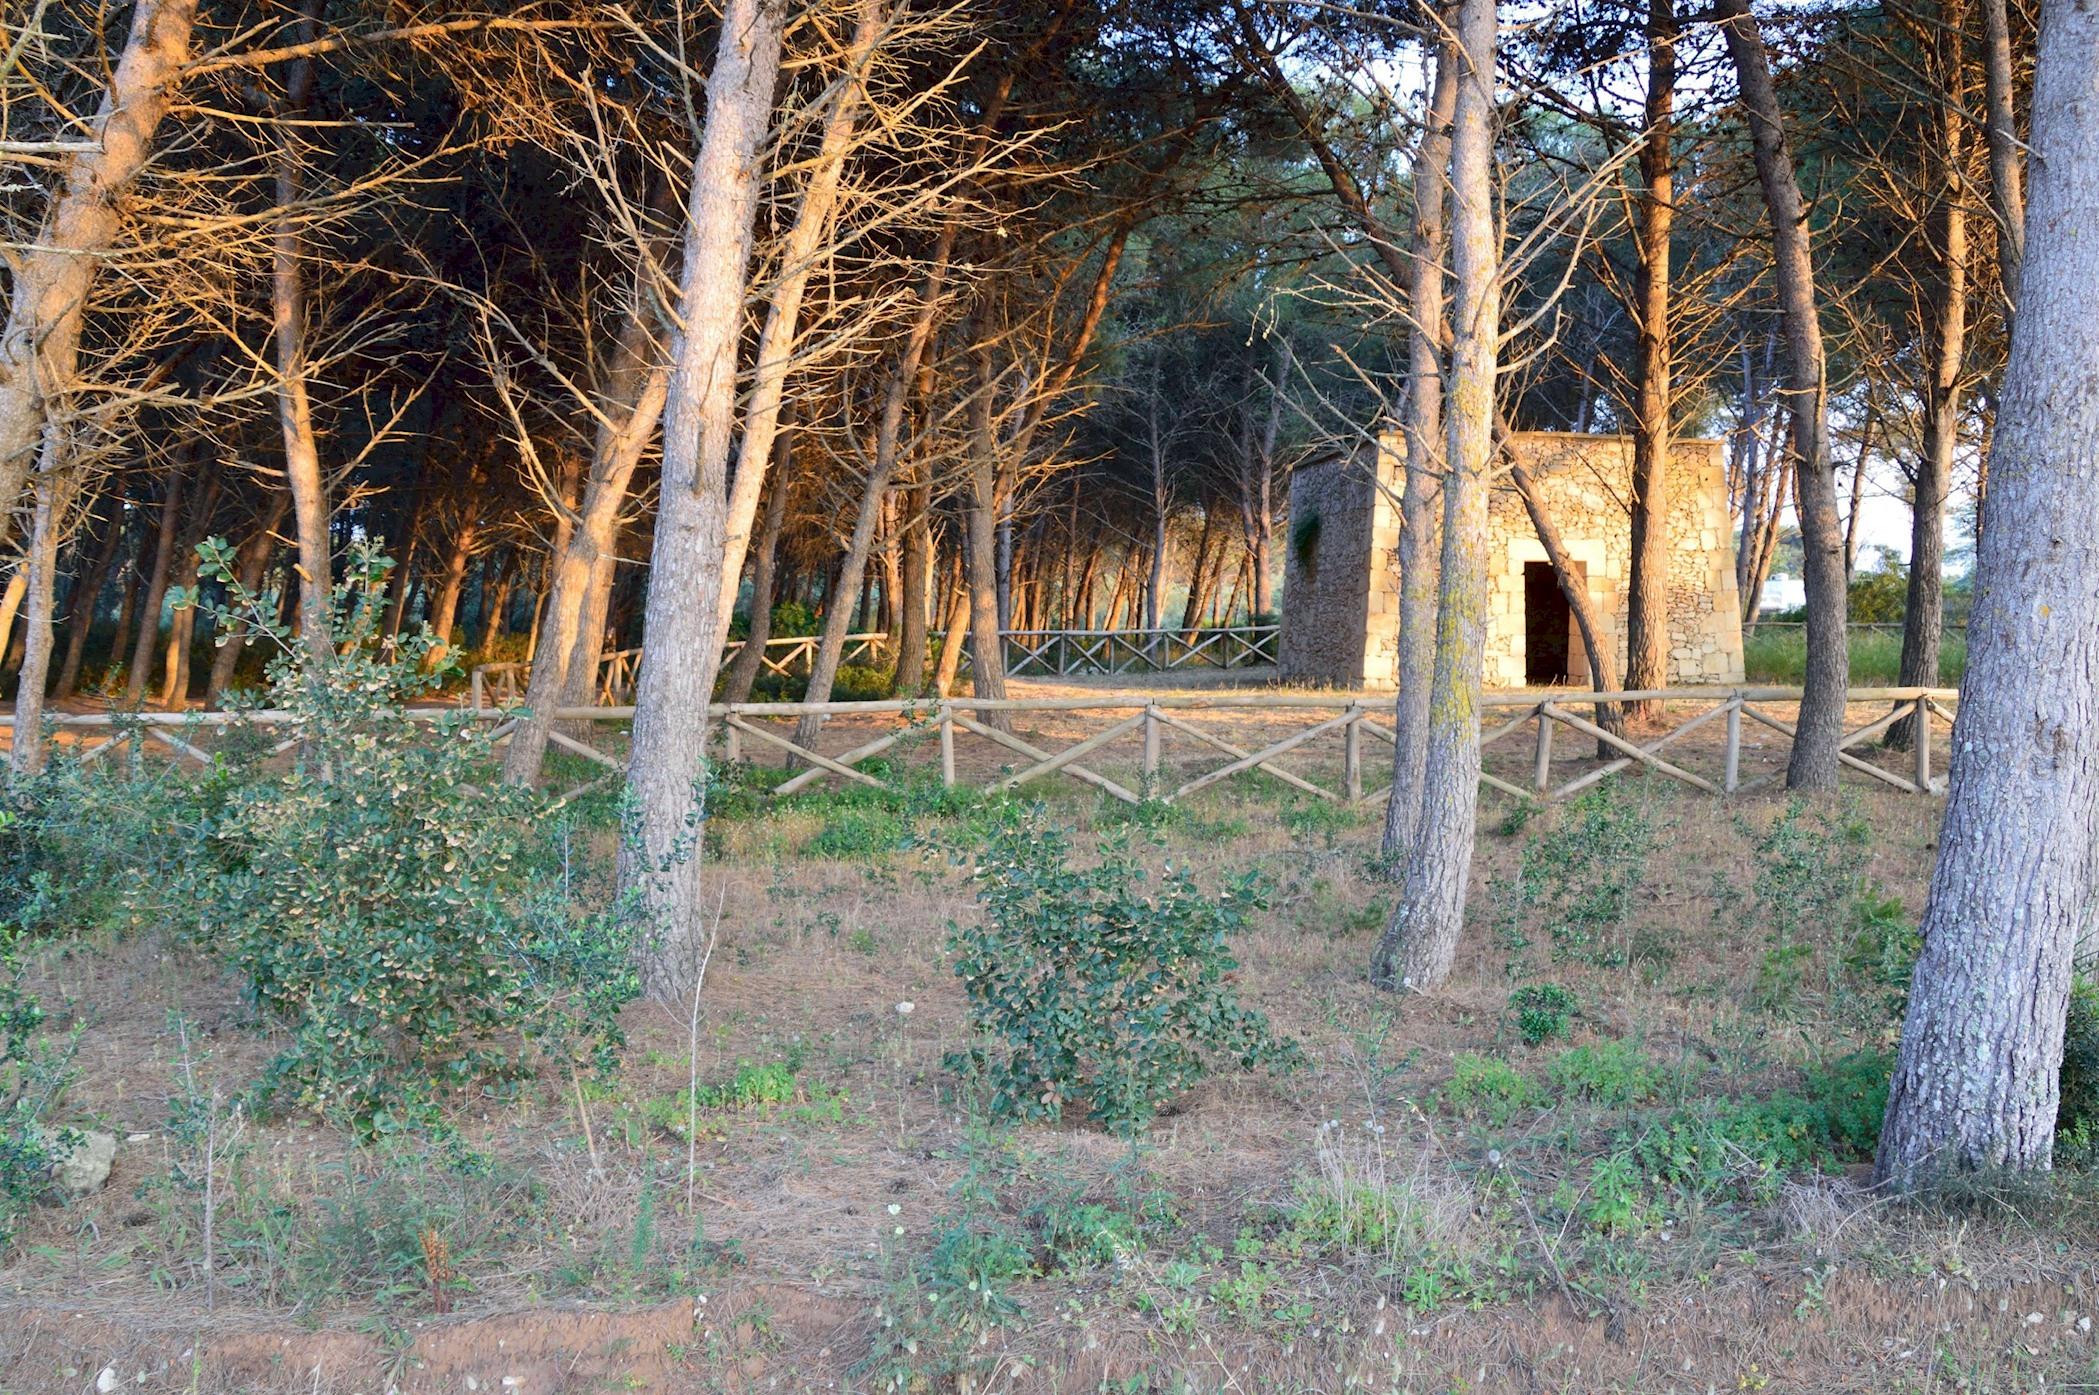 Elcisia luxe beach house photo 20076187